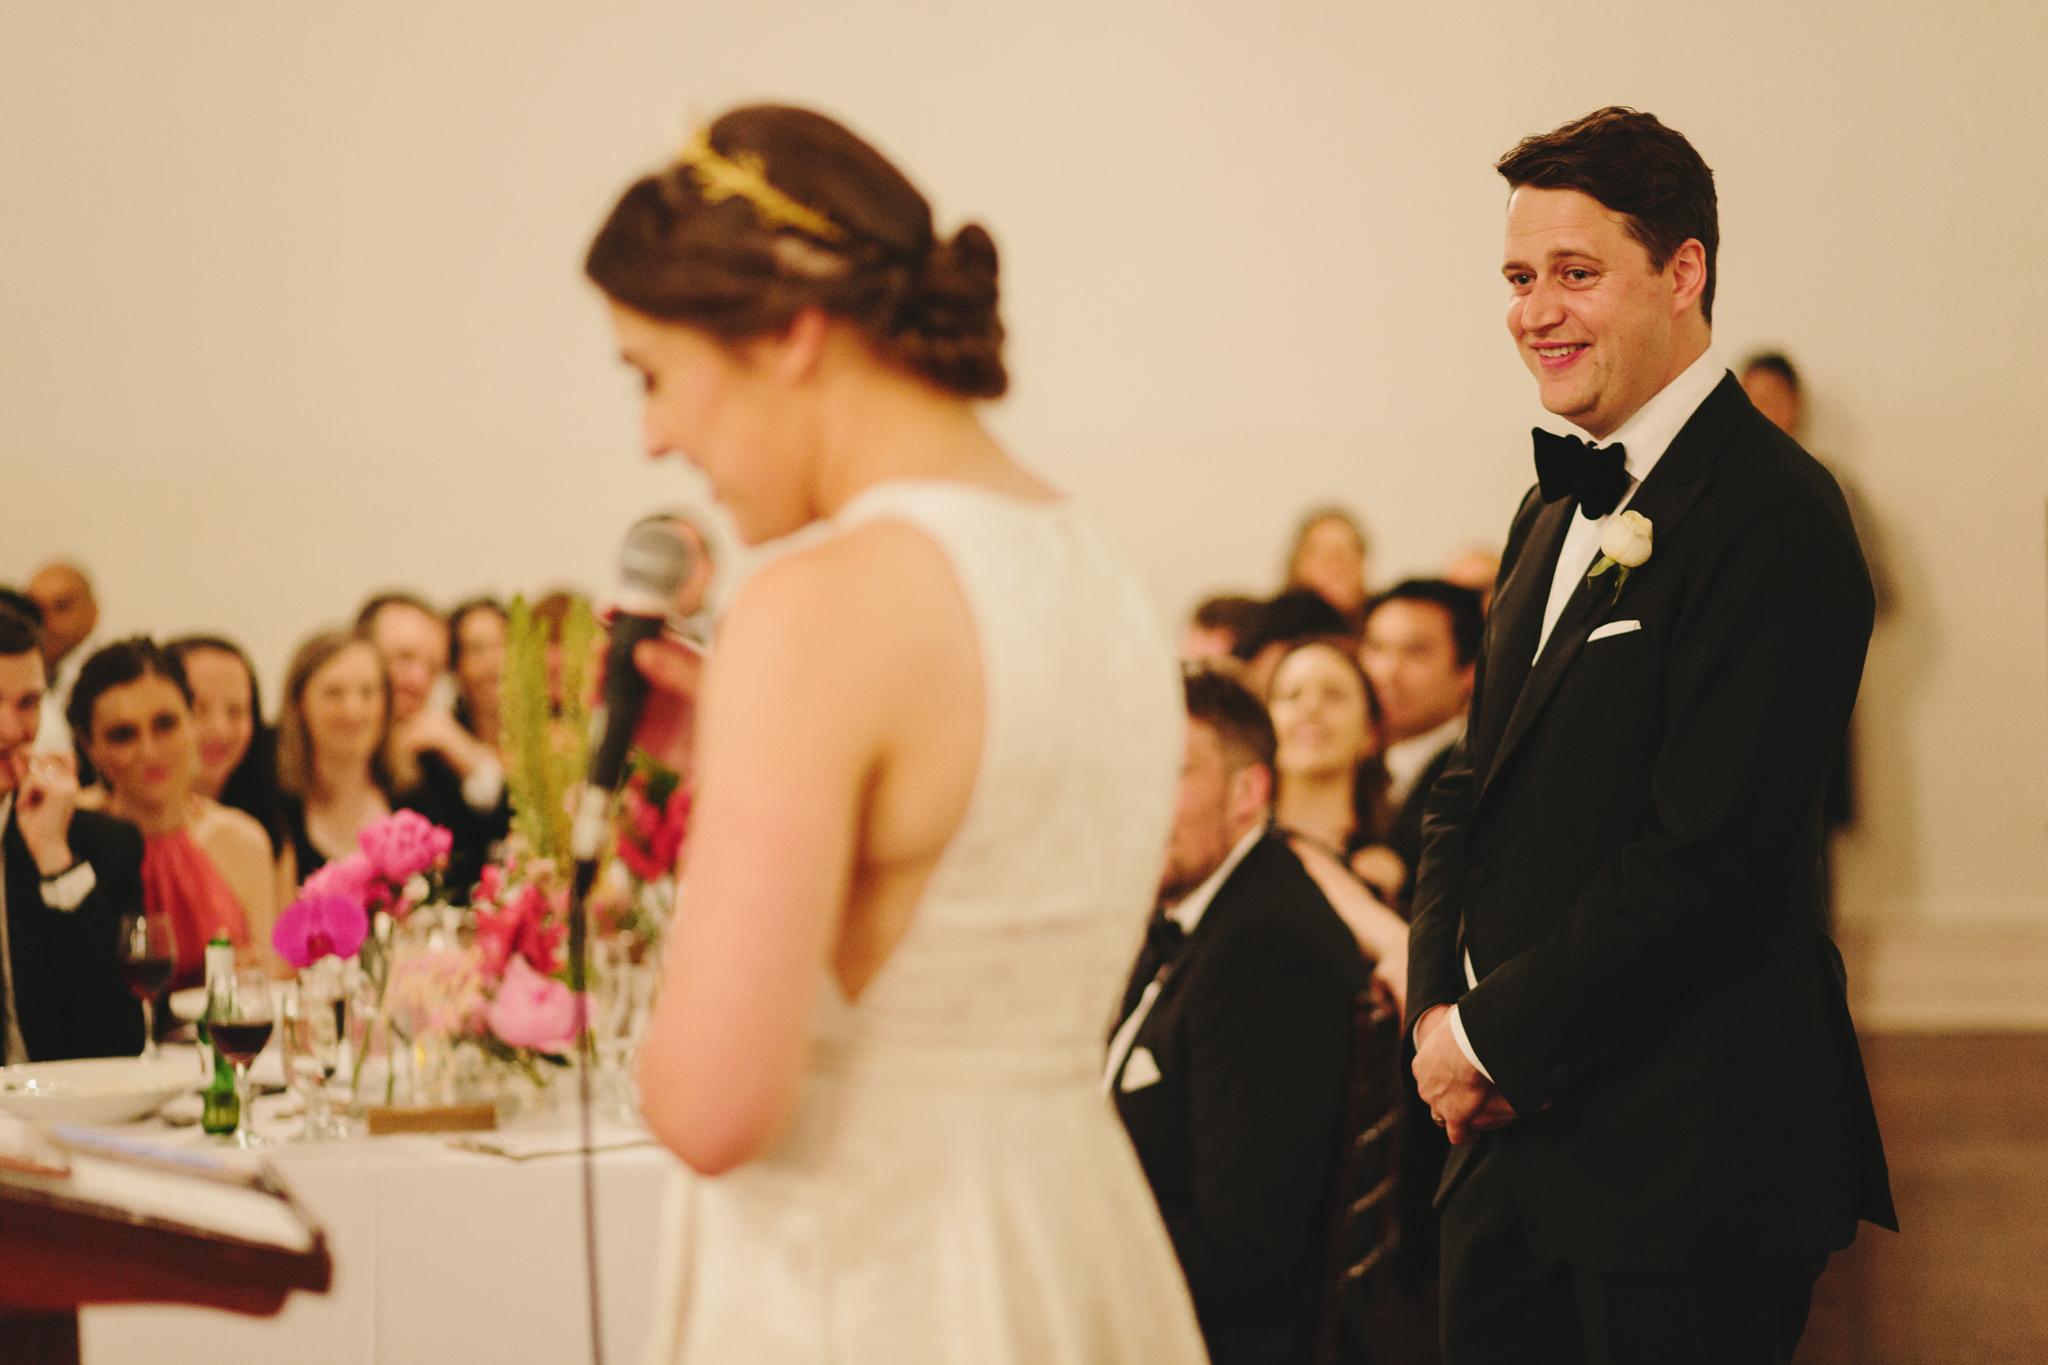 Abbotsford_Convent_Wedding_Peter_Anna128.JPG